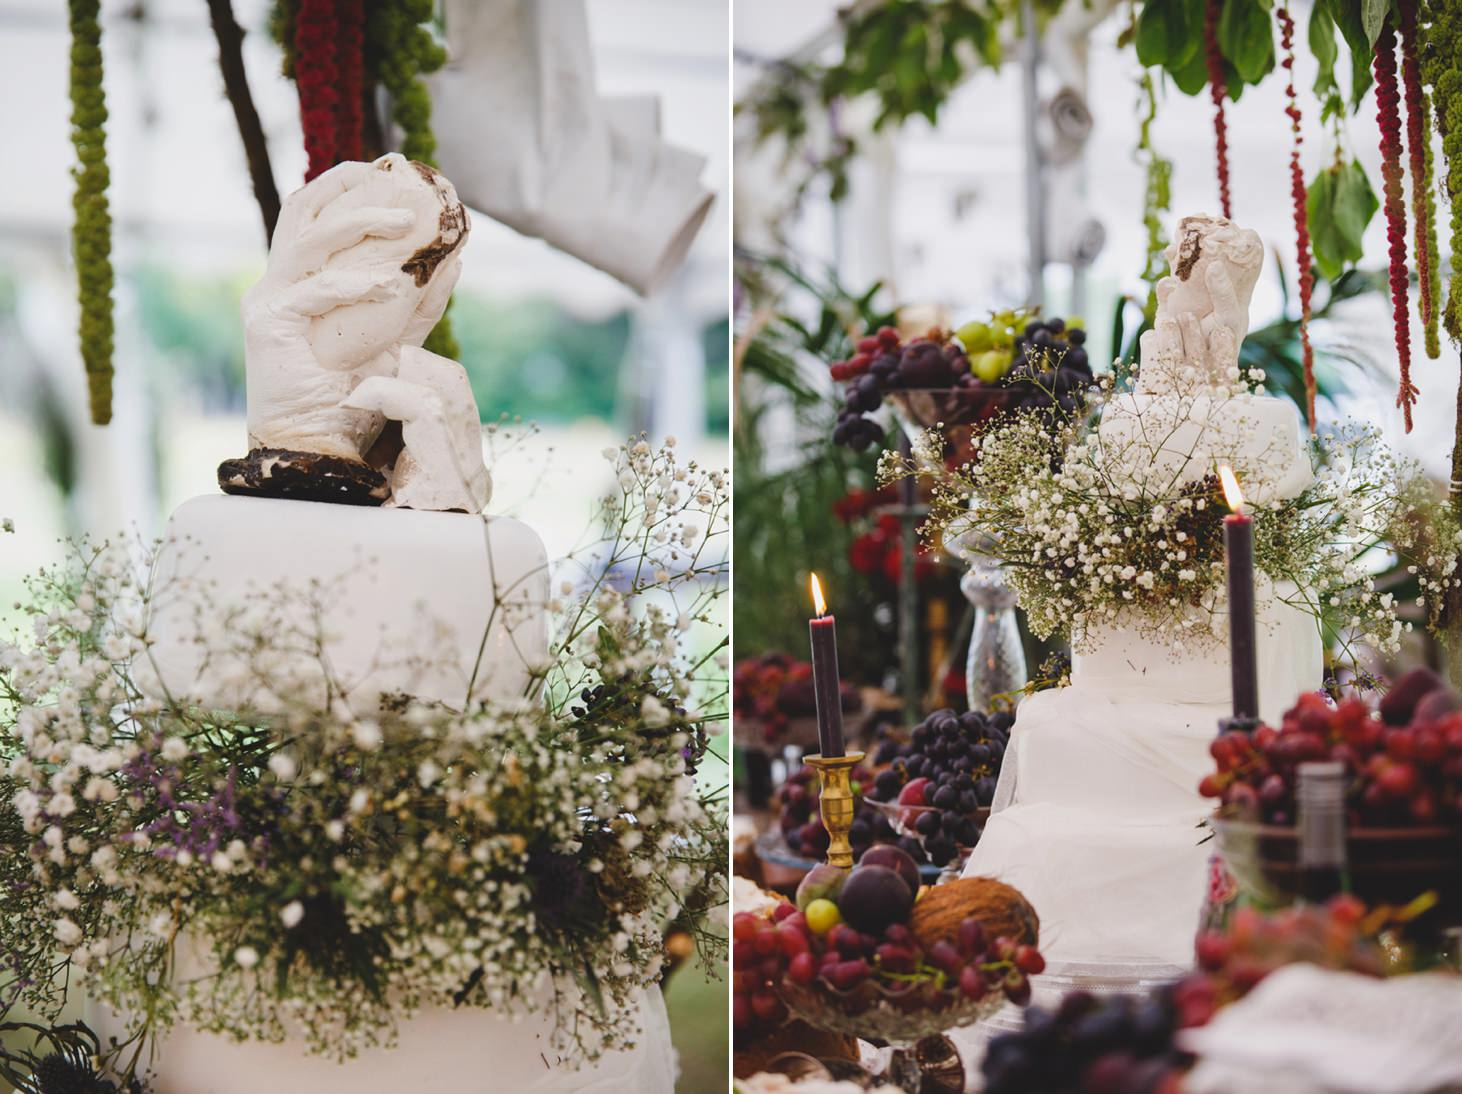 mount stuart wedding photography handmade sculpture cake